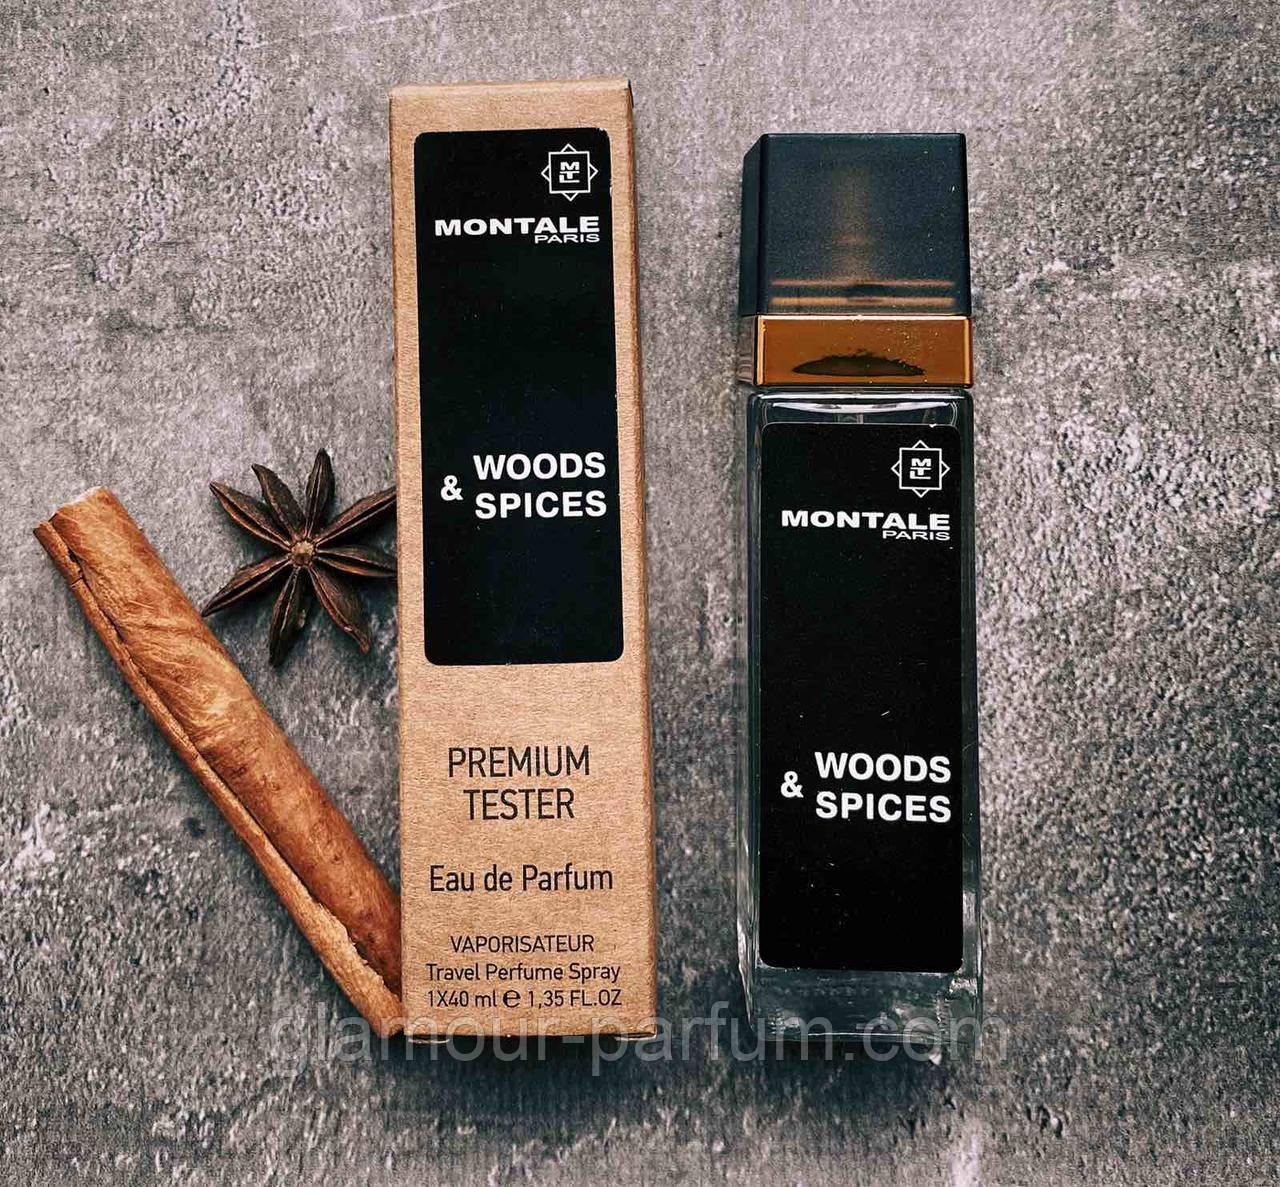 TESTER мини-парфюм Montale Wood & Spices (Монталь Вуд Энд Спайсес) 40мл реплика ОПТ